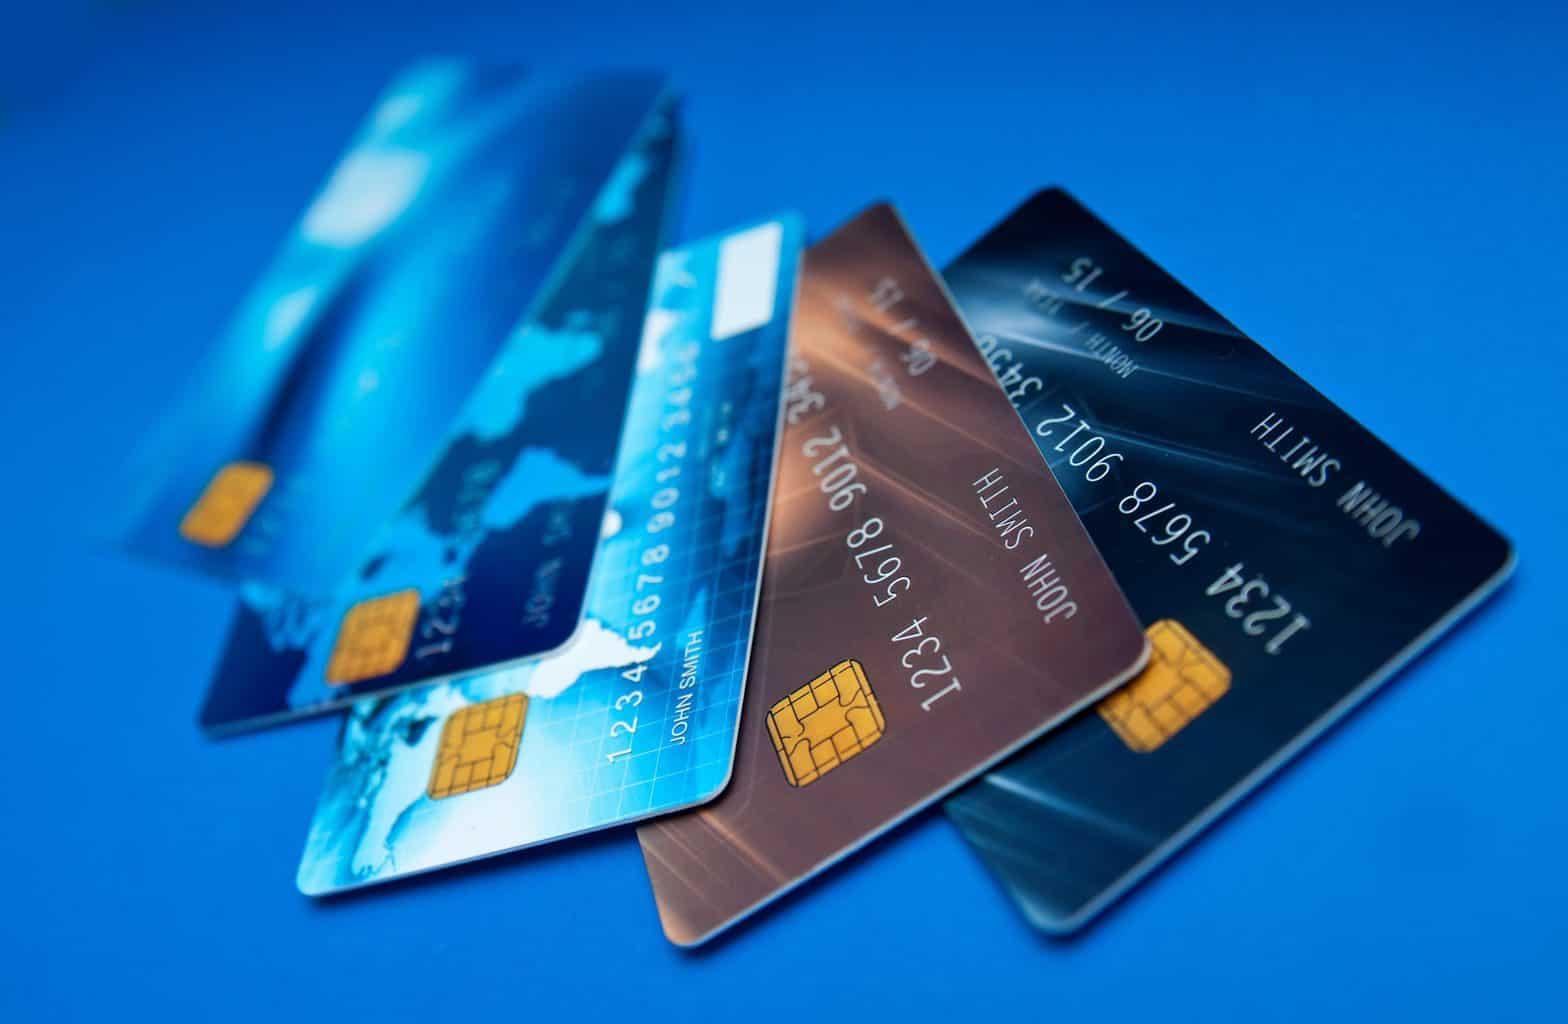 Things To Consider When Choosing A Prepaid Card Provider